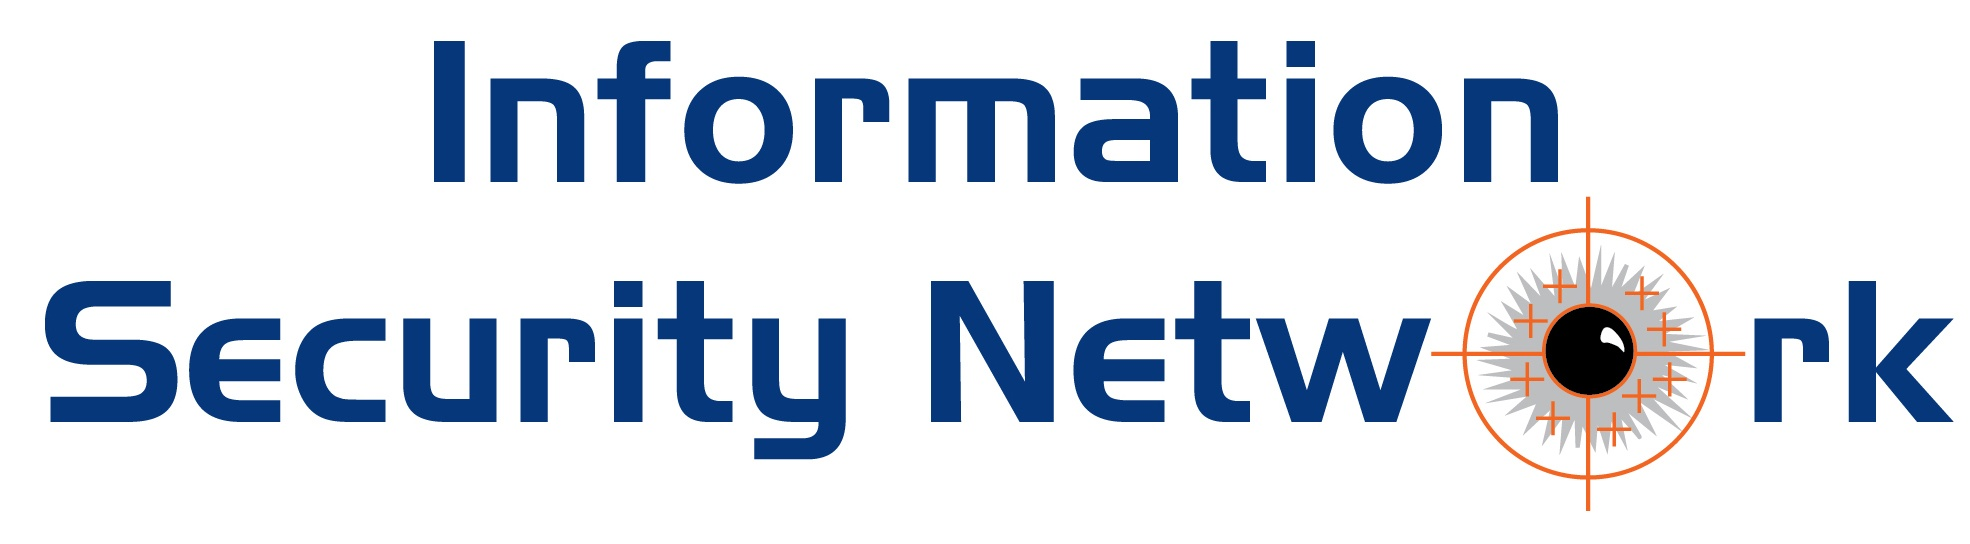 InfoSecNet-logo.jpg